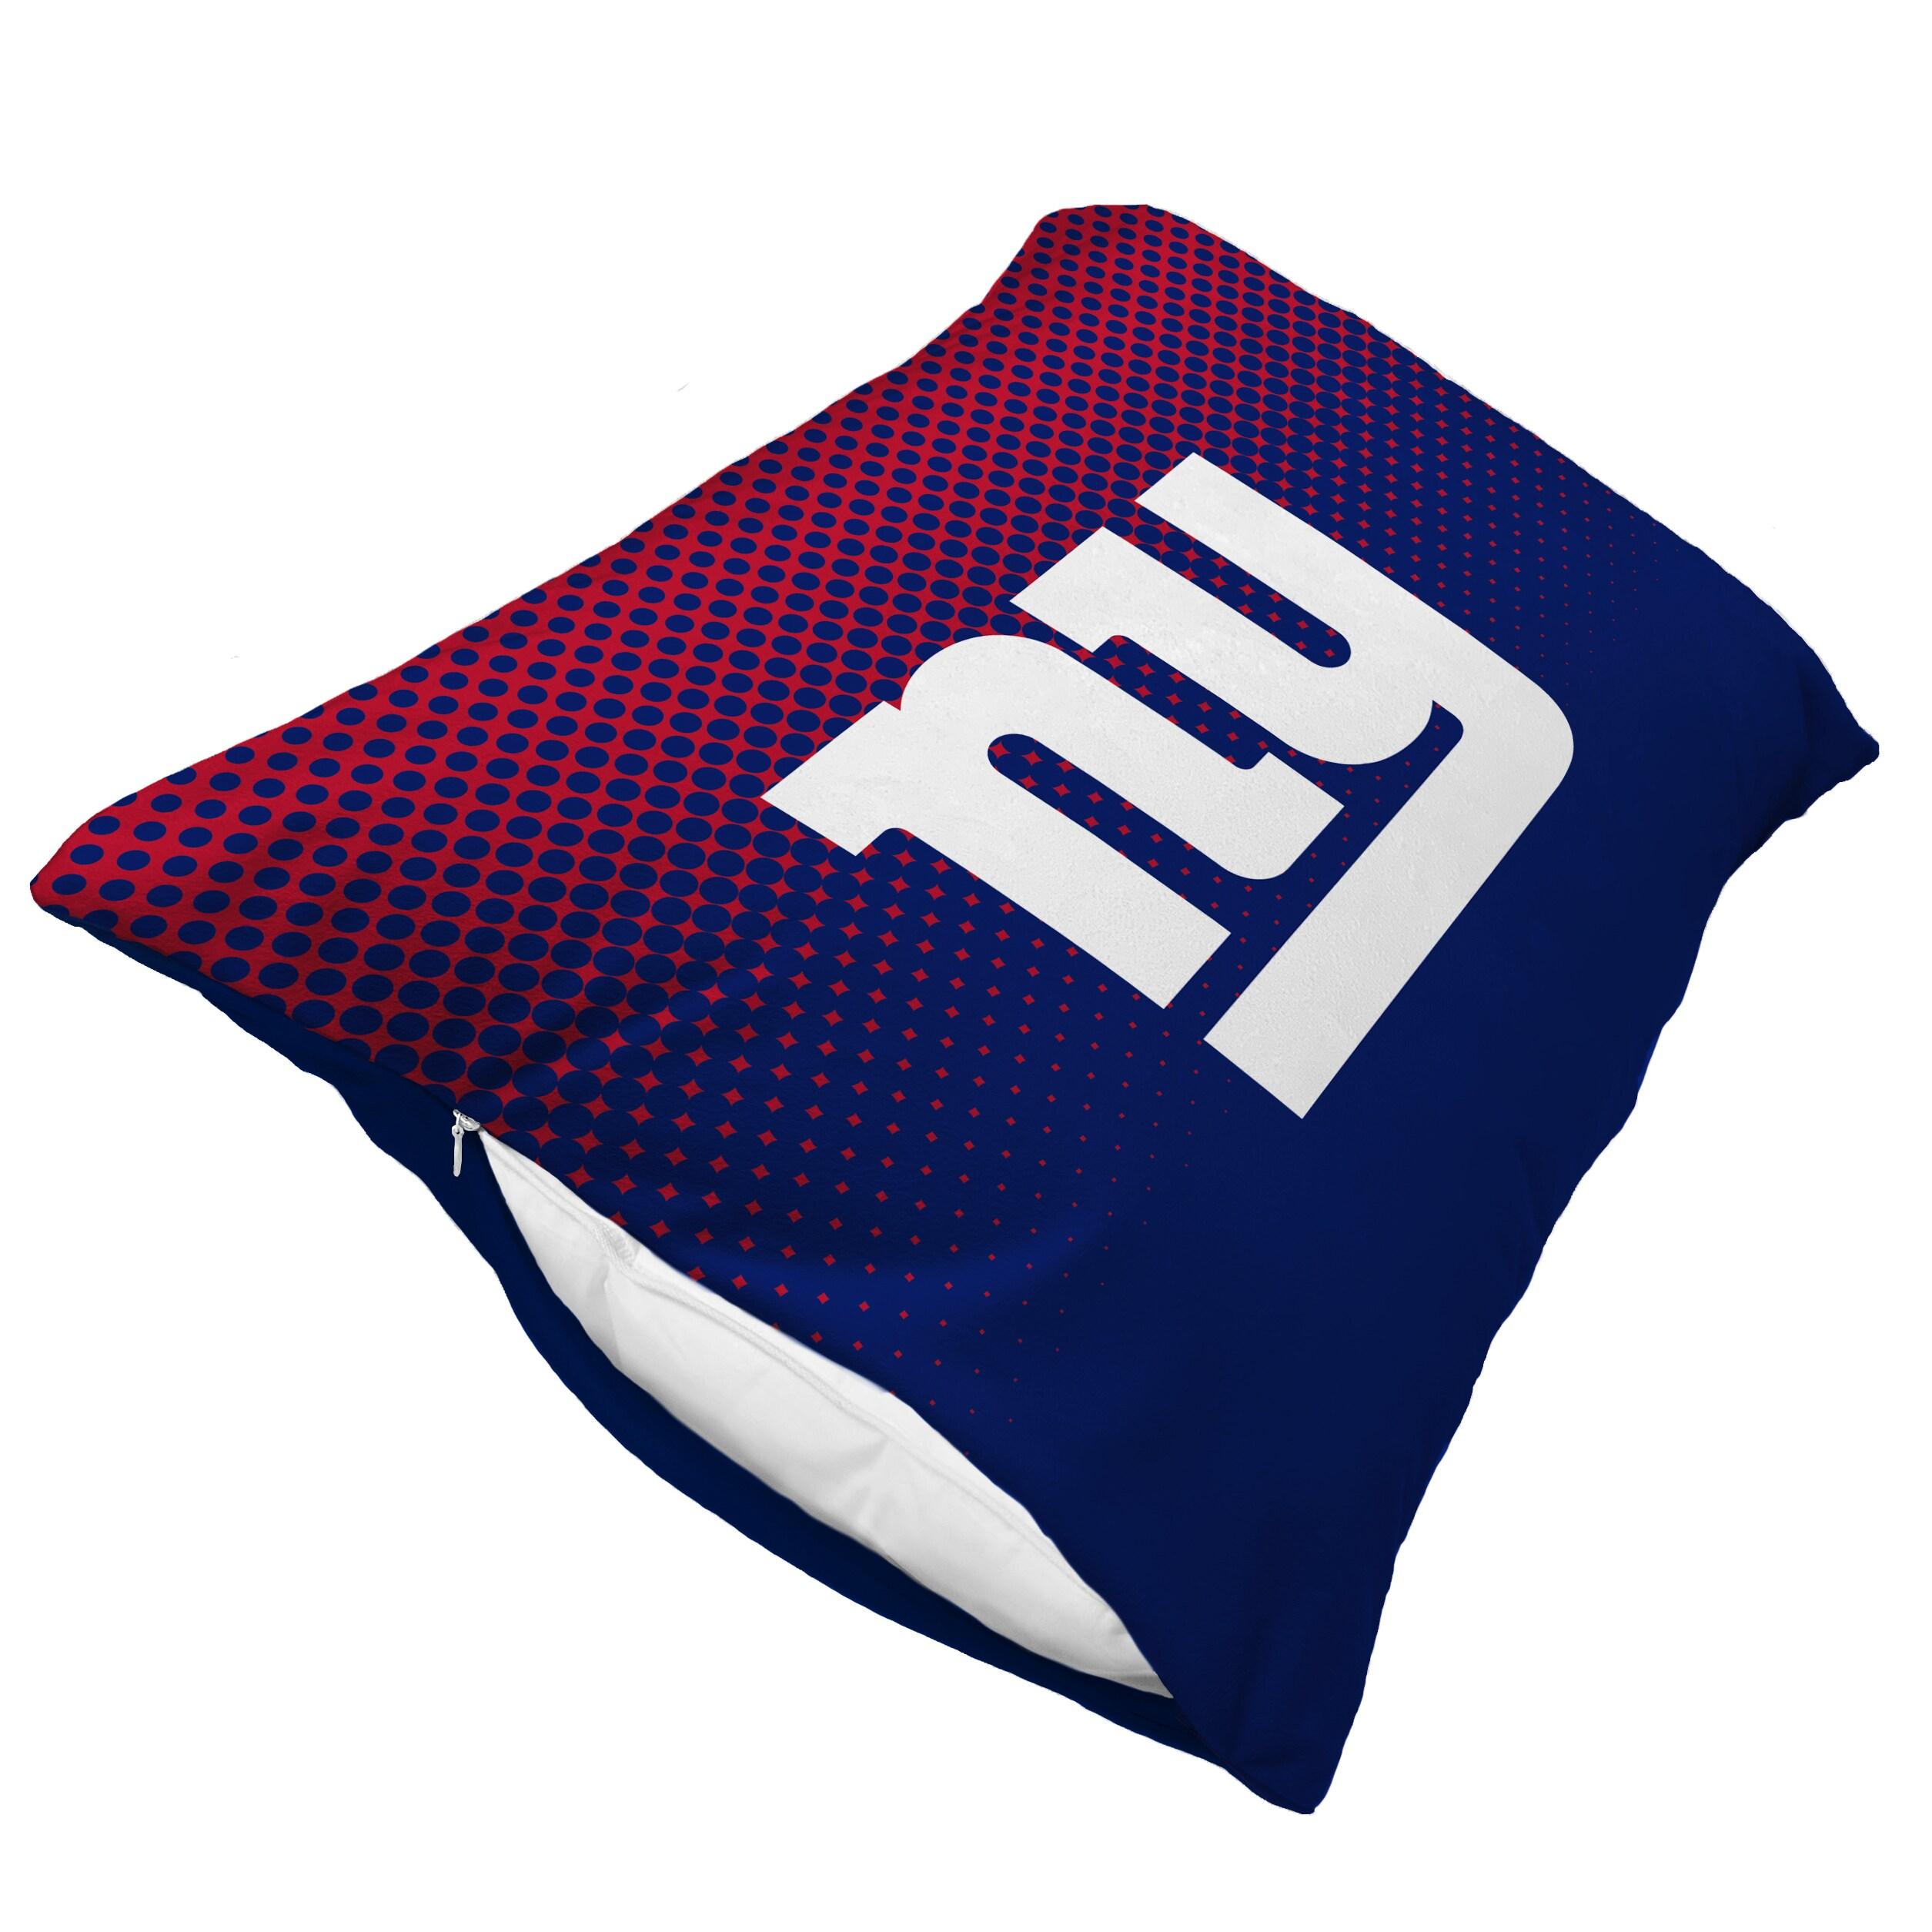 New York Giants Dot Fade Plush Standard Pillow Protector - Blue